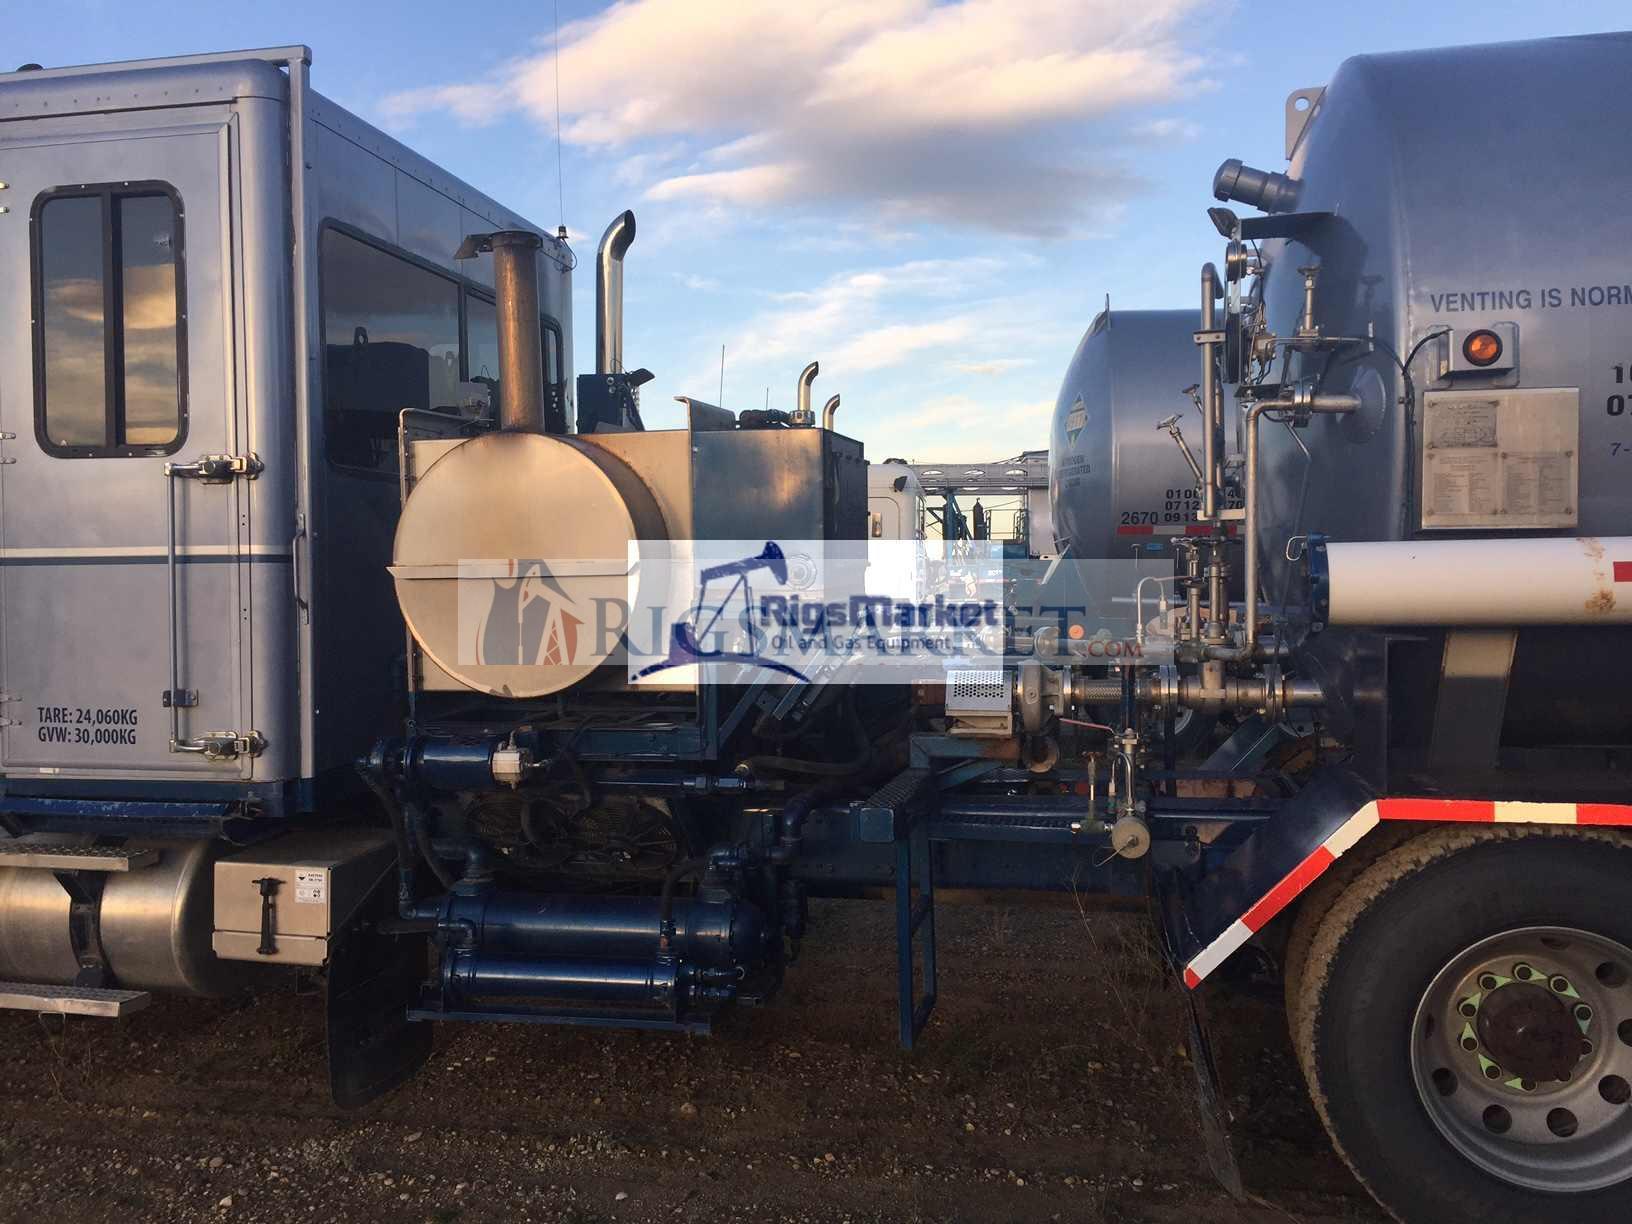 180k Bodyload Nitrogen Pumper - Rigs Market